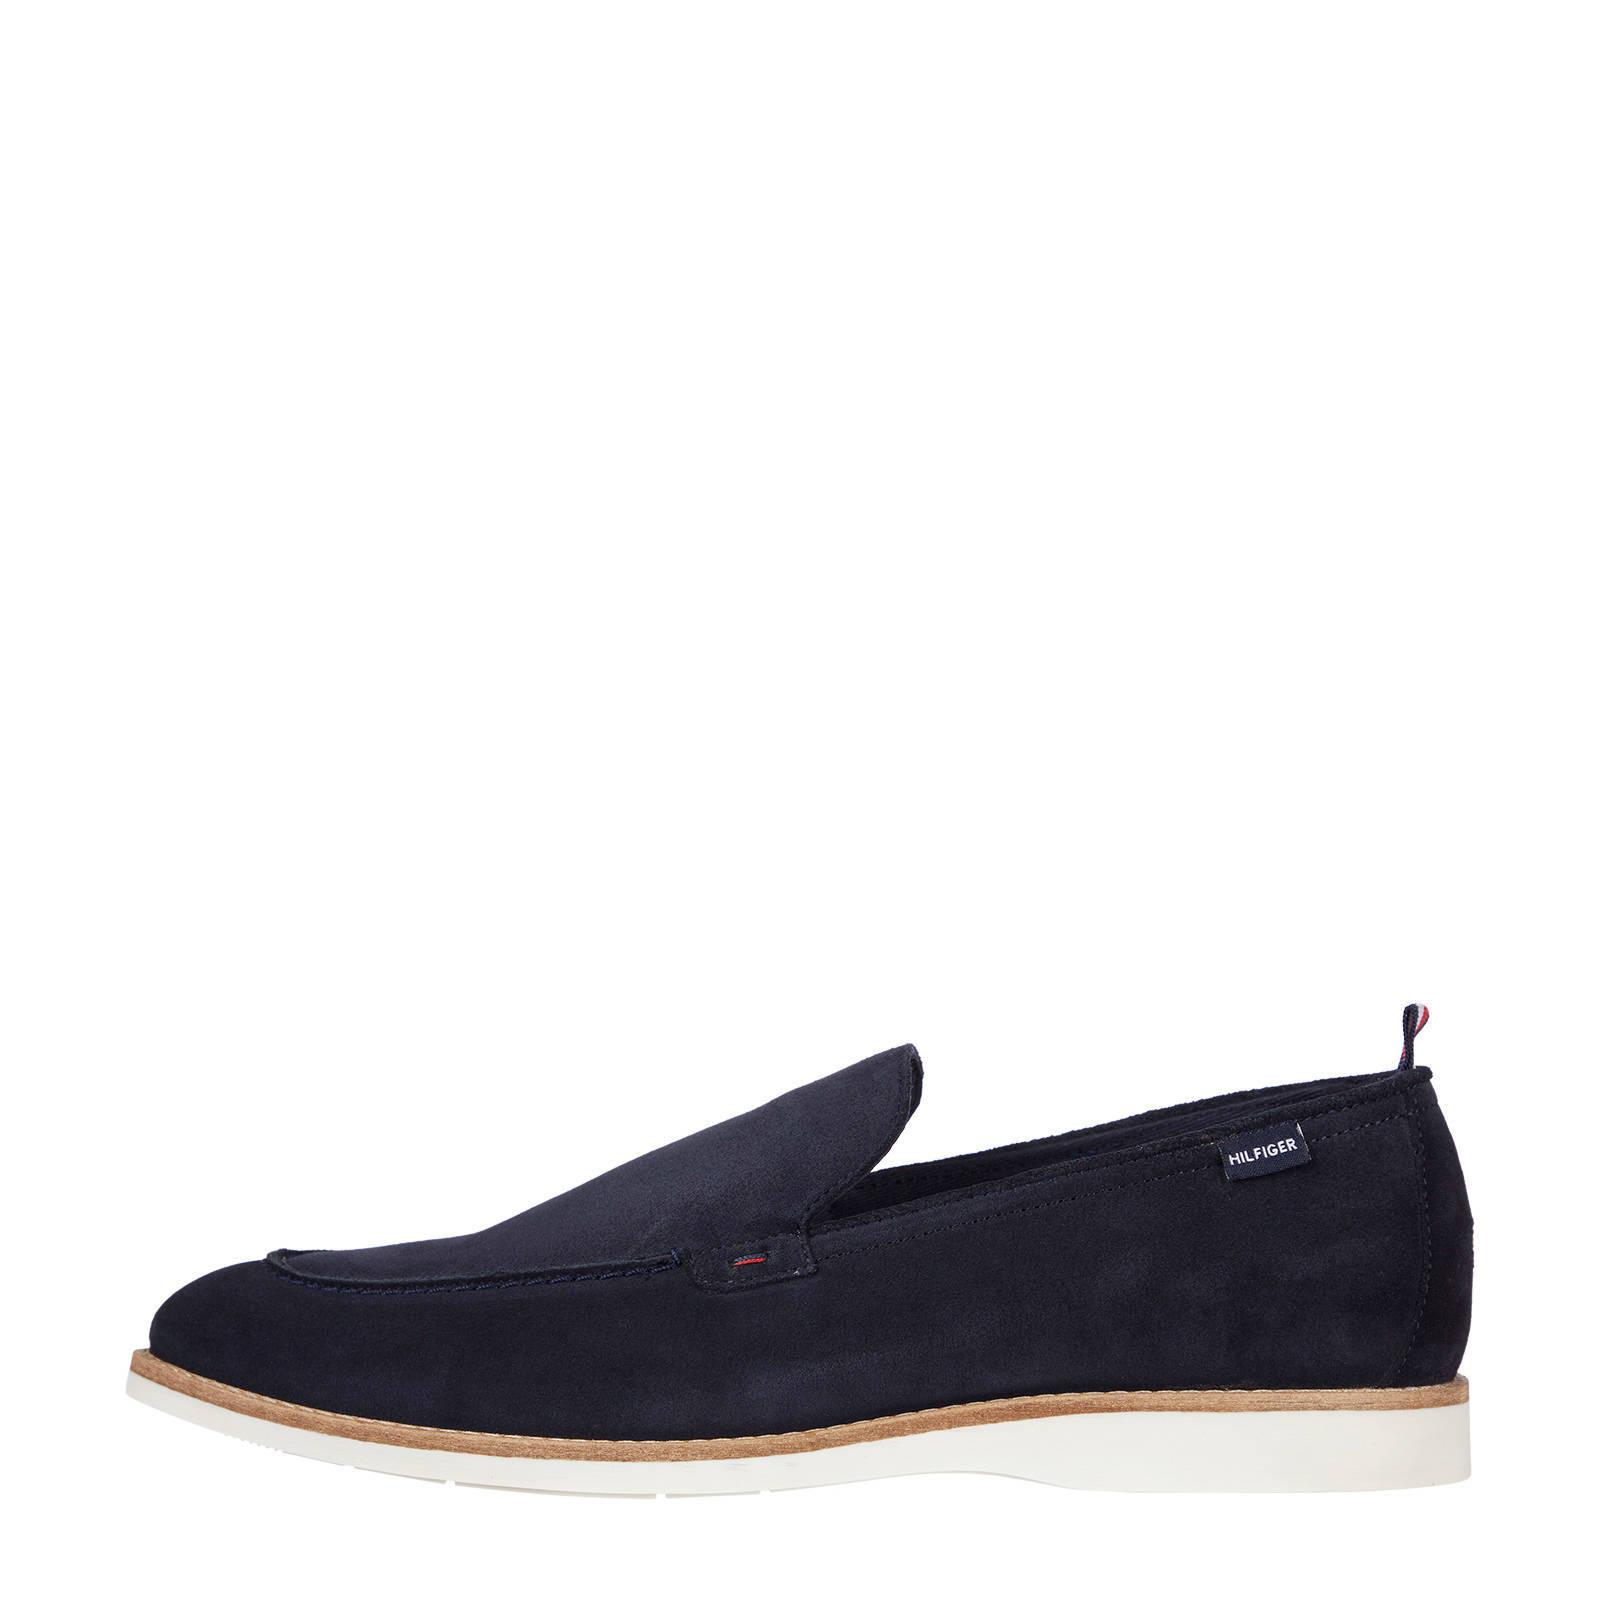 Tommy Hilfiger Casual Spring Suède Loafer suède instappers donkerblauw online kopen